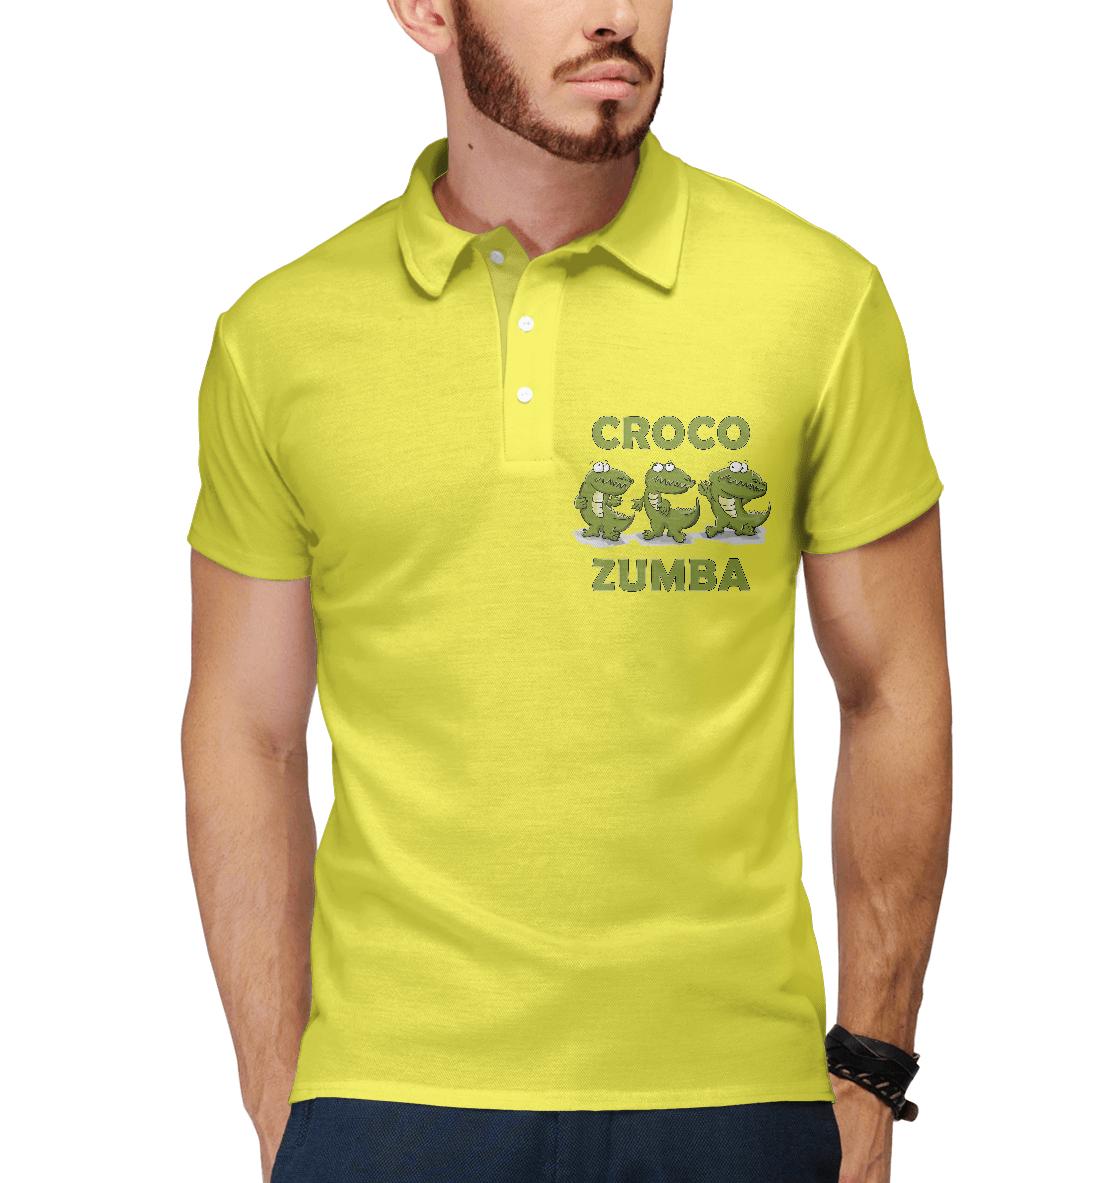 Купить Croco zumba, Printbar, Поло, FIT-973712-pol-2